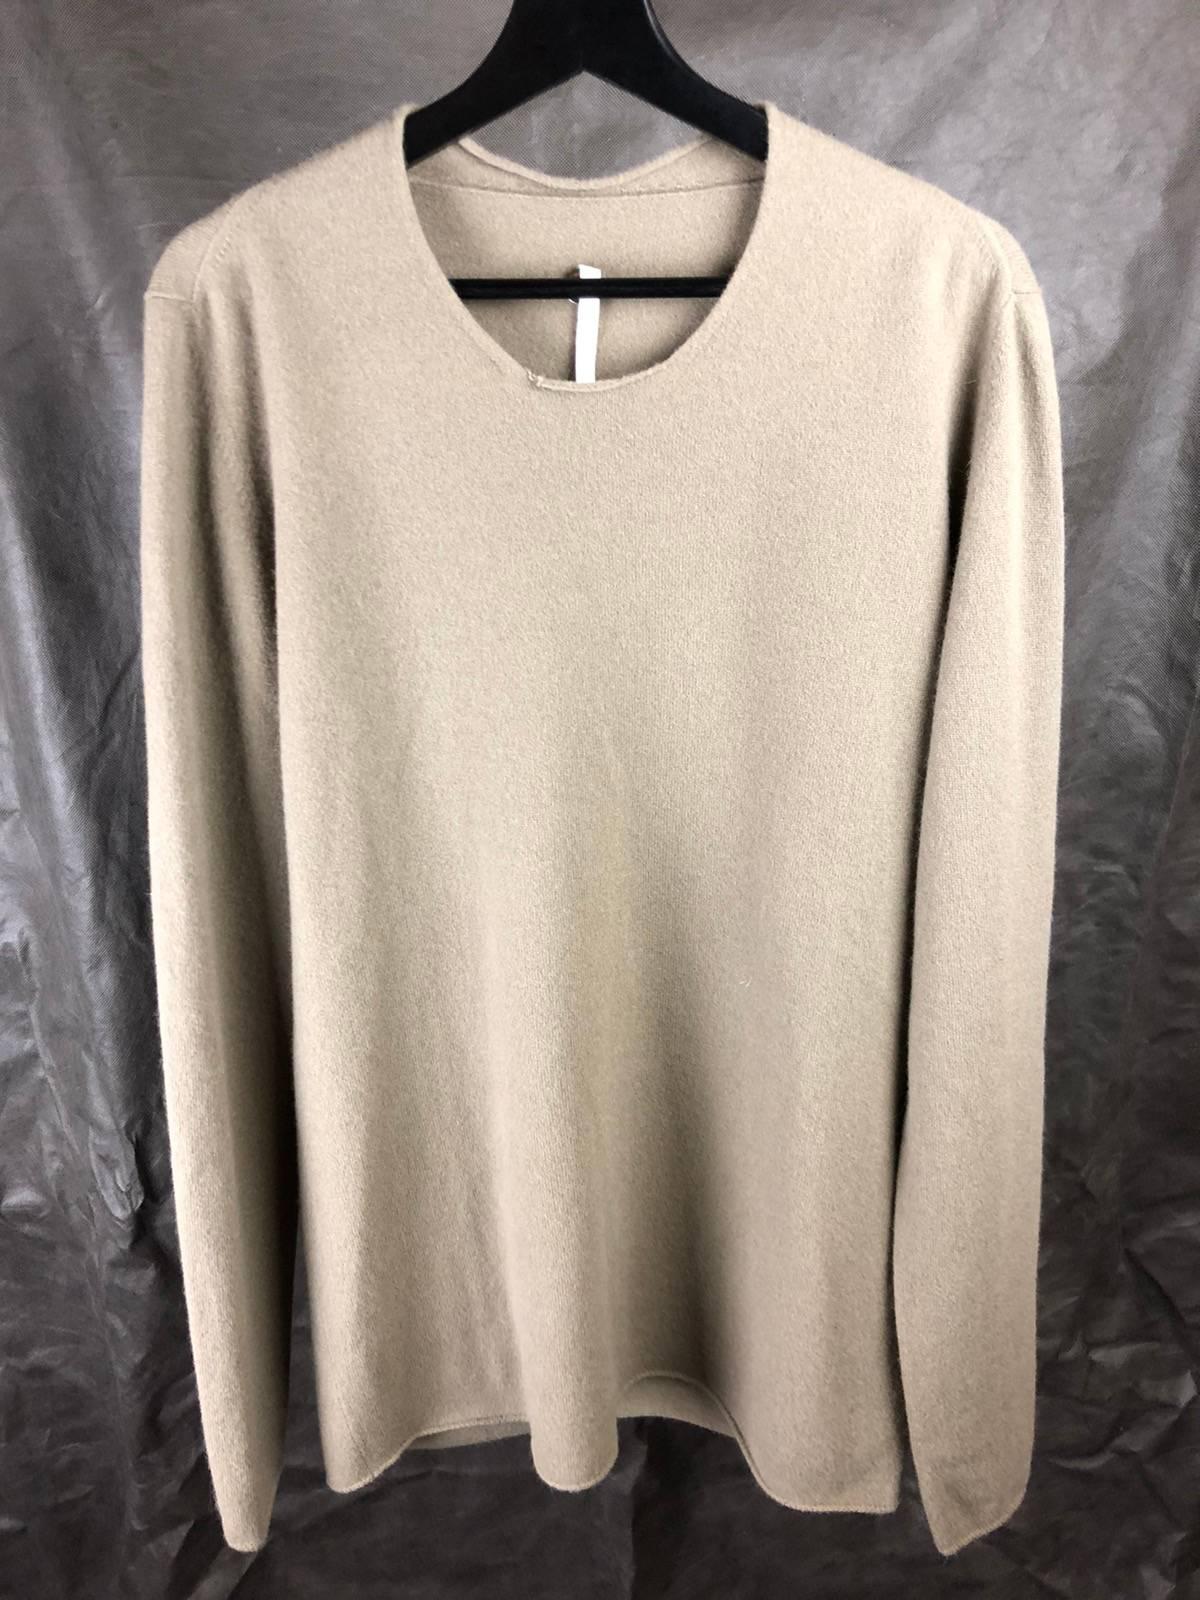 Label Under Construction New! Wool Angora Sweater Size L $450